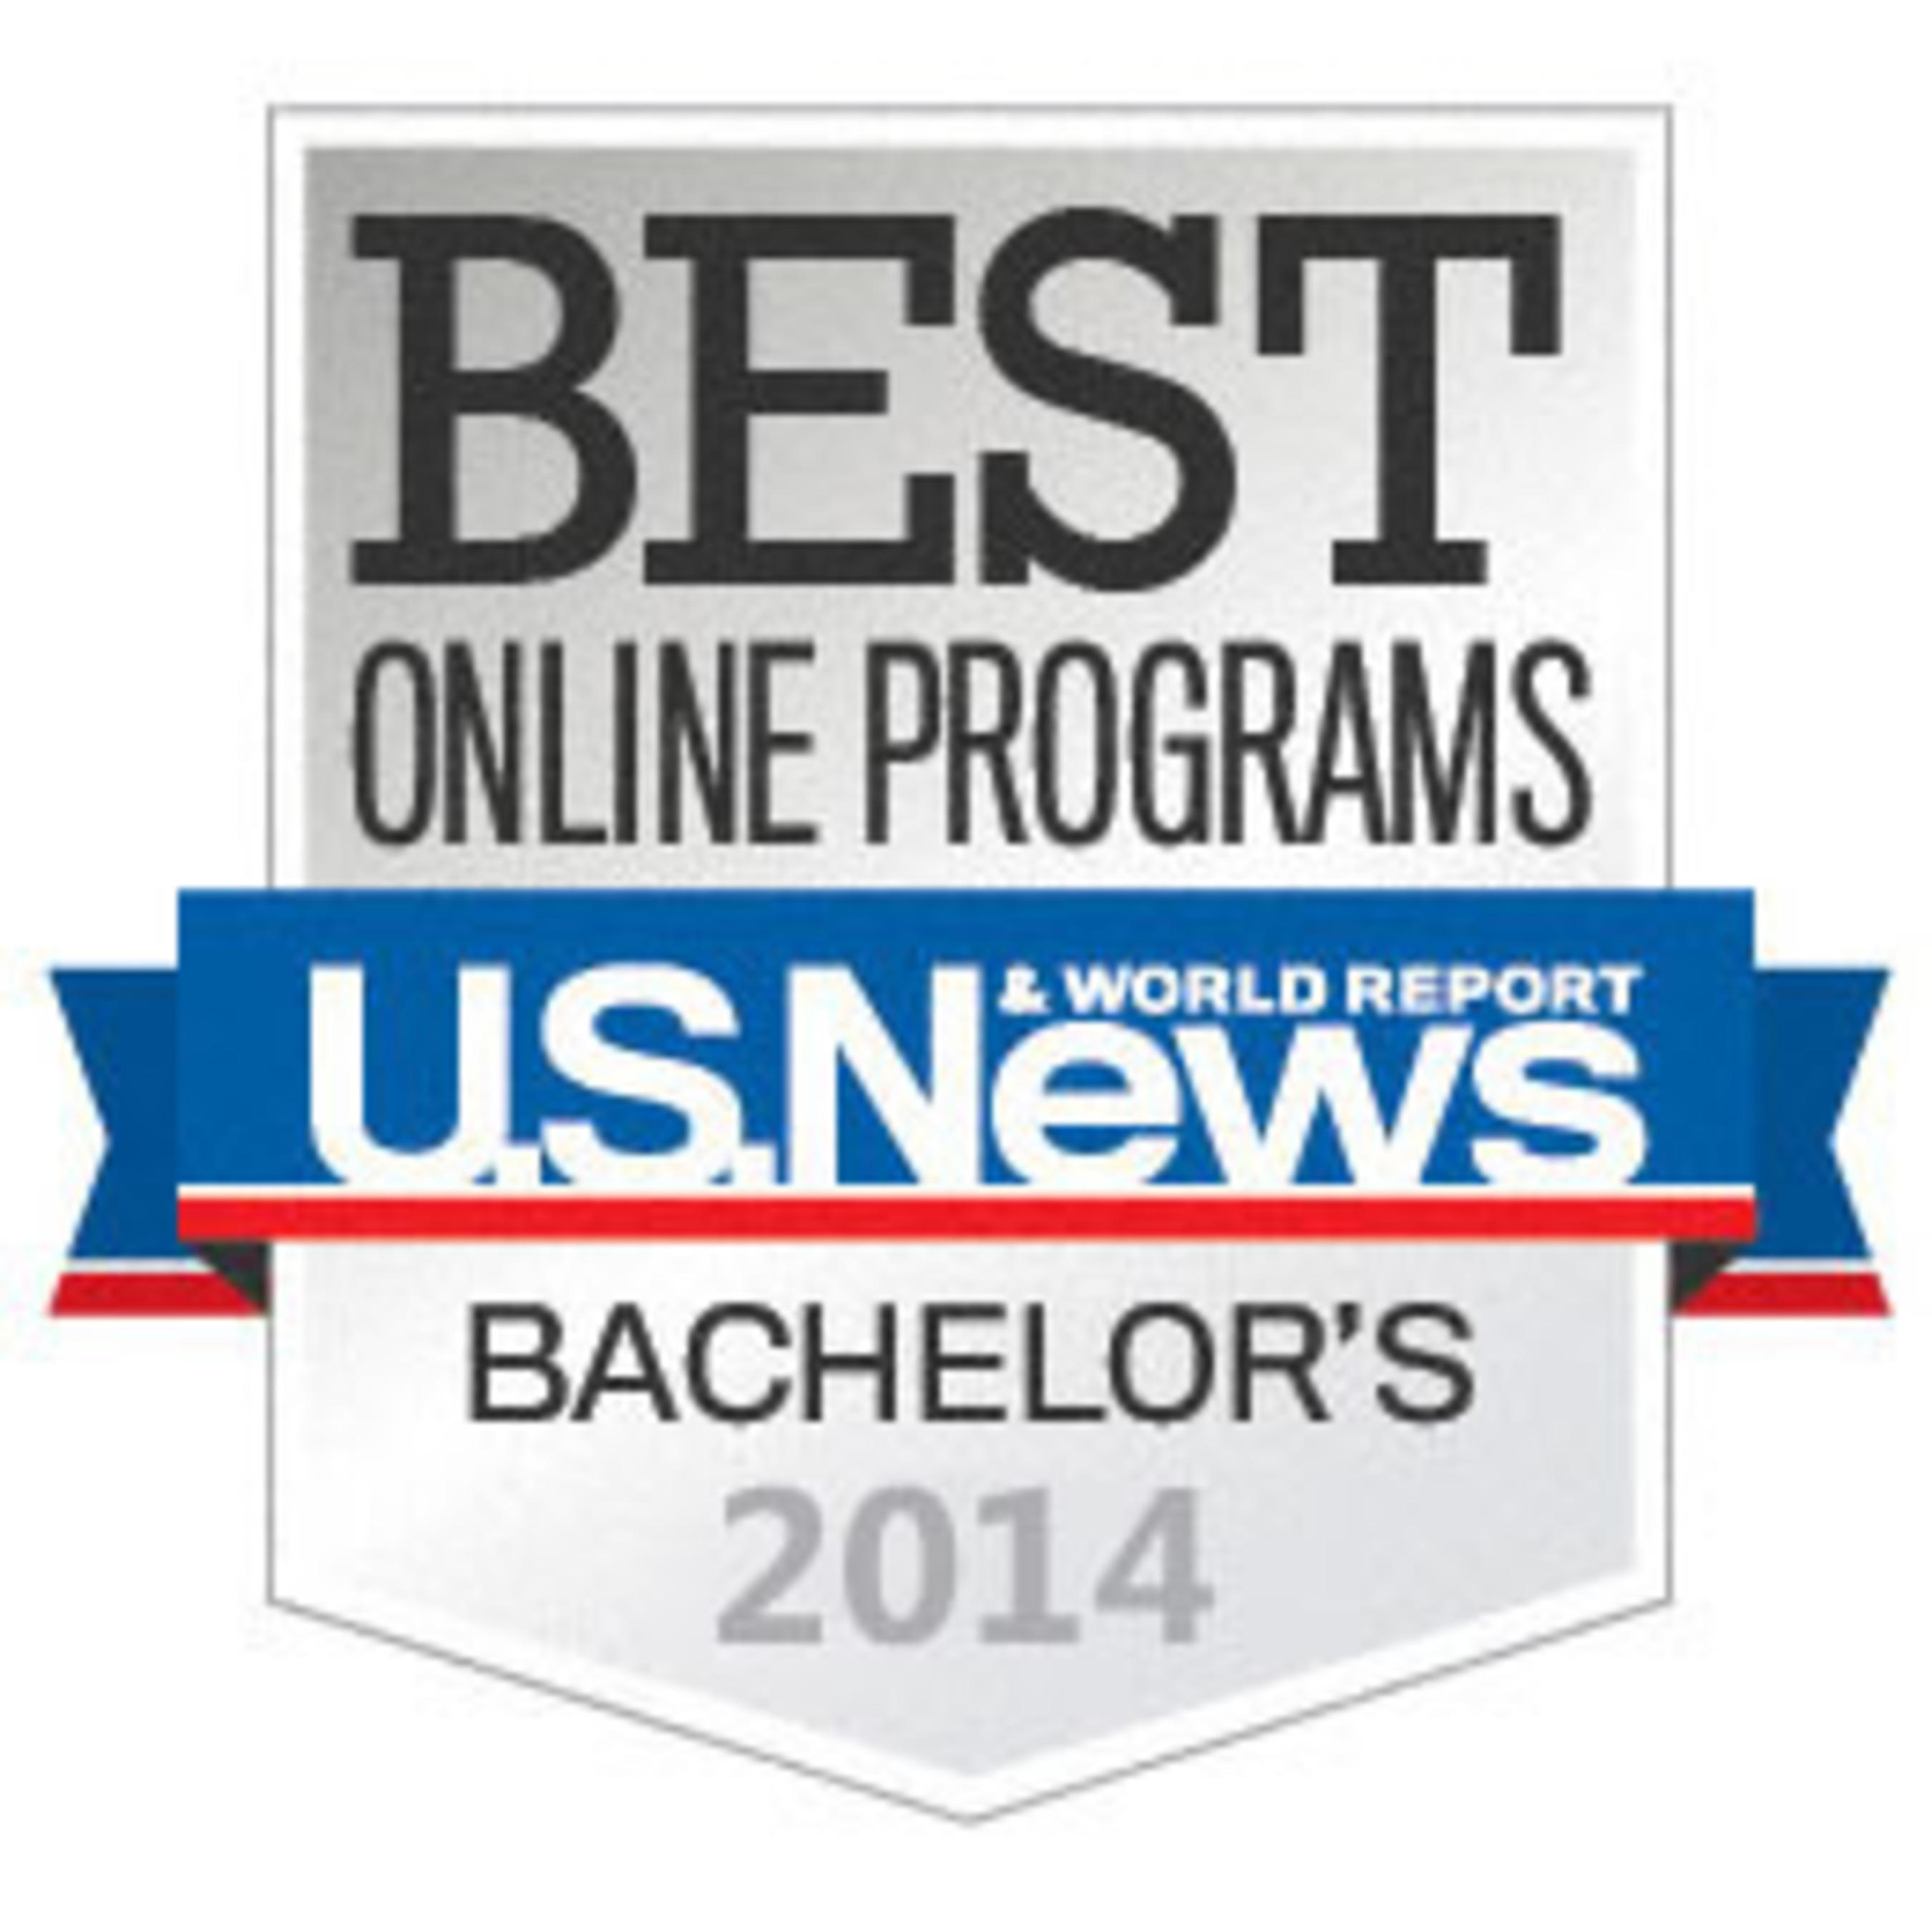 City University of Seattle's Online Programs Rank Among Top 50 in U.S. (PRNewsFoto/City University of Seattle) (PRNewsFoto/CITY UNIVERSITY OF SEATTLE)